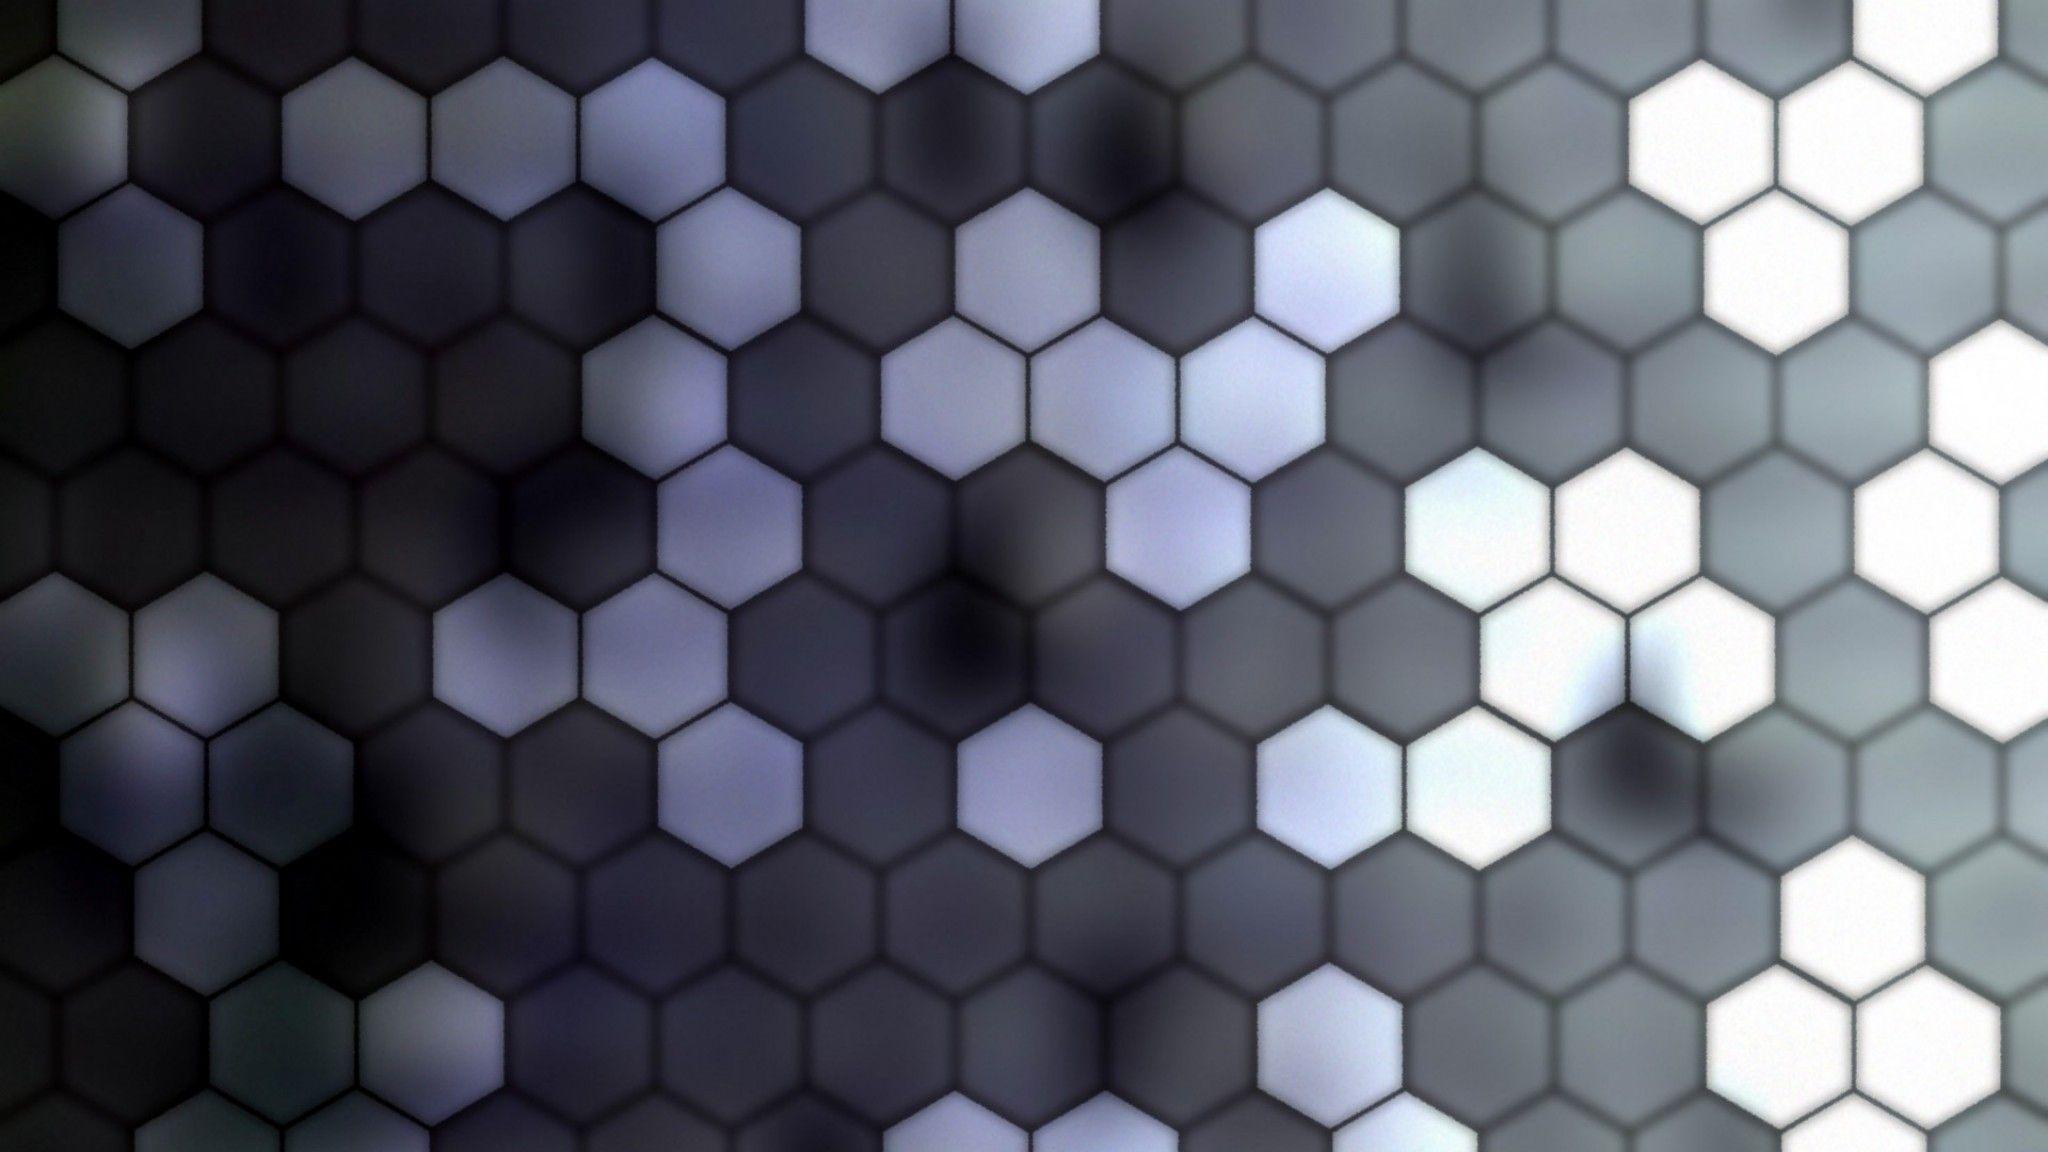 Wallpaper Paste Solvite Adhesive Flakes Mix Homebase